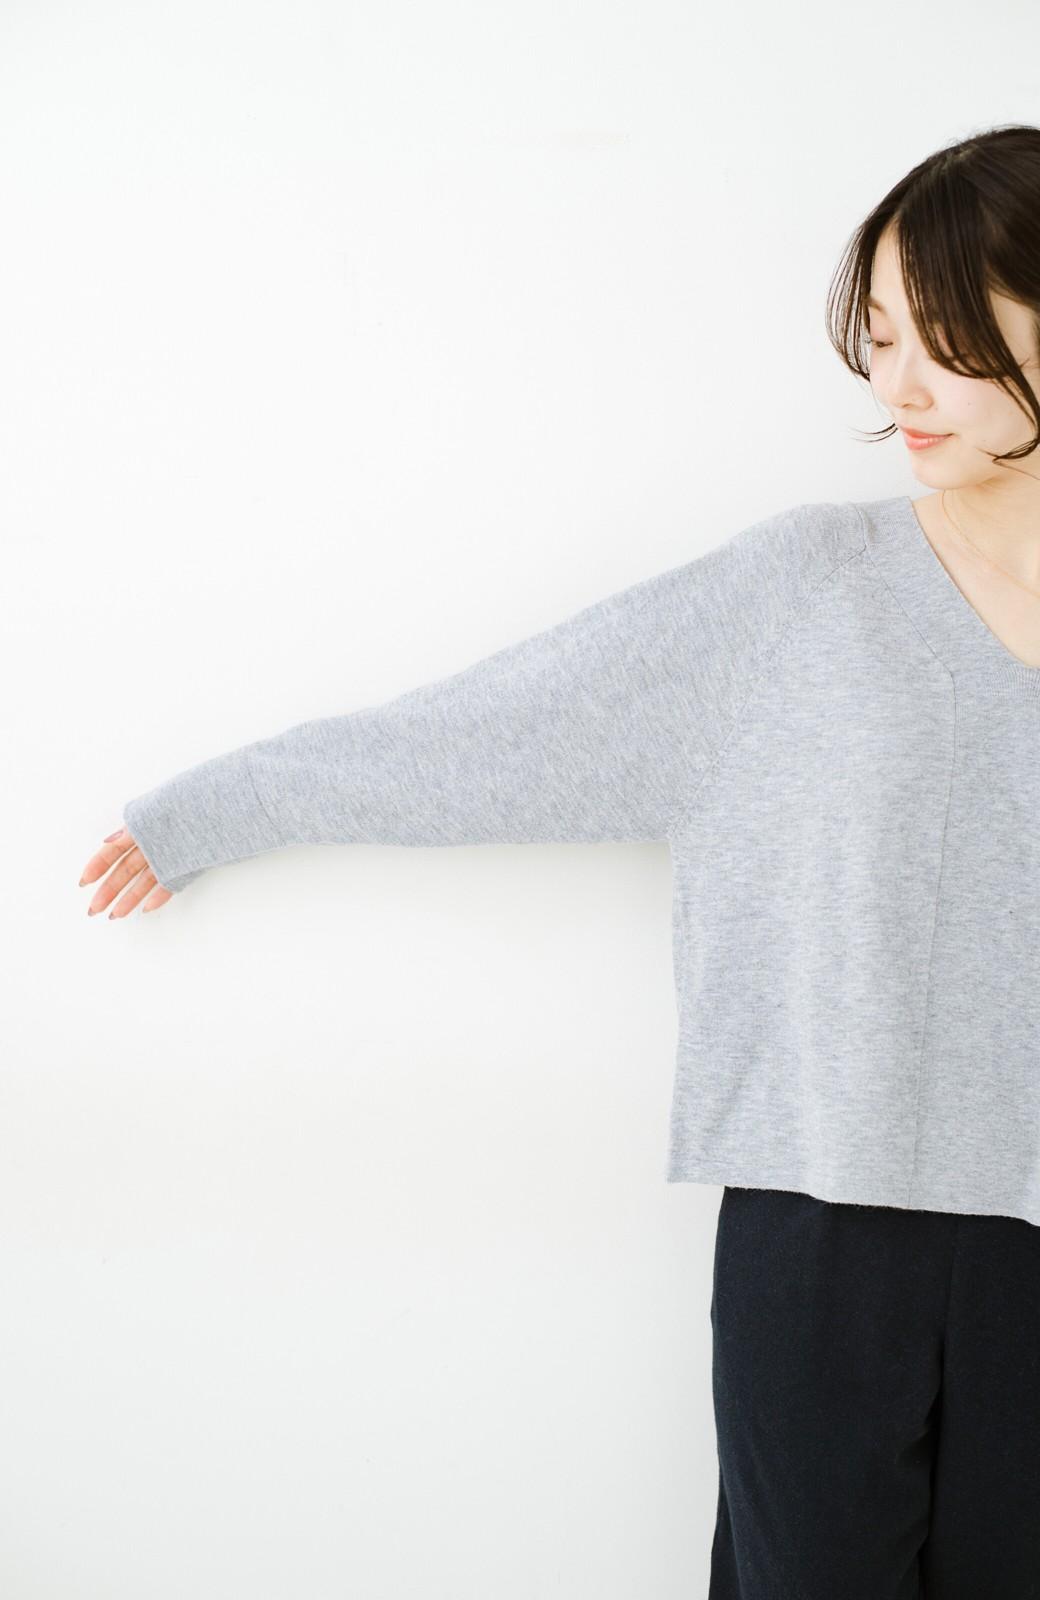 haco! セットで着るだけパッとかわいい ニットトップス&ノースリーブニットワンピースセット <グレー>の商品写真26